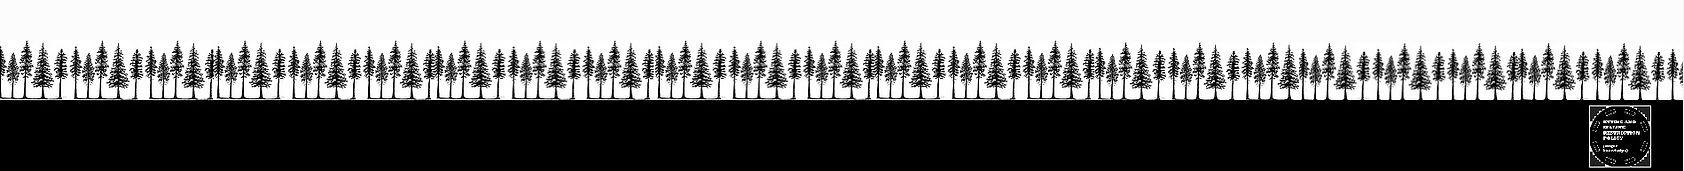 Tree black footer with token_JPEGa.jpg